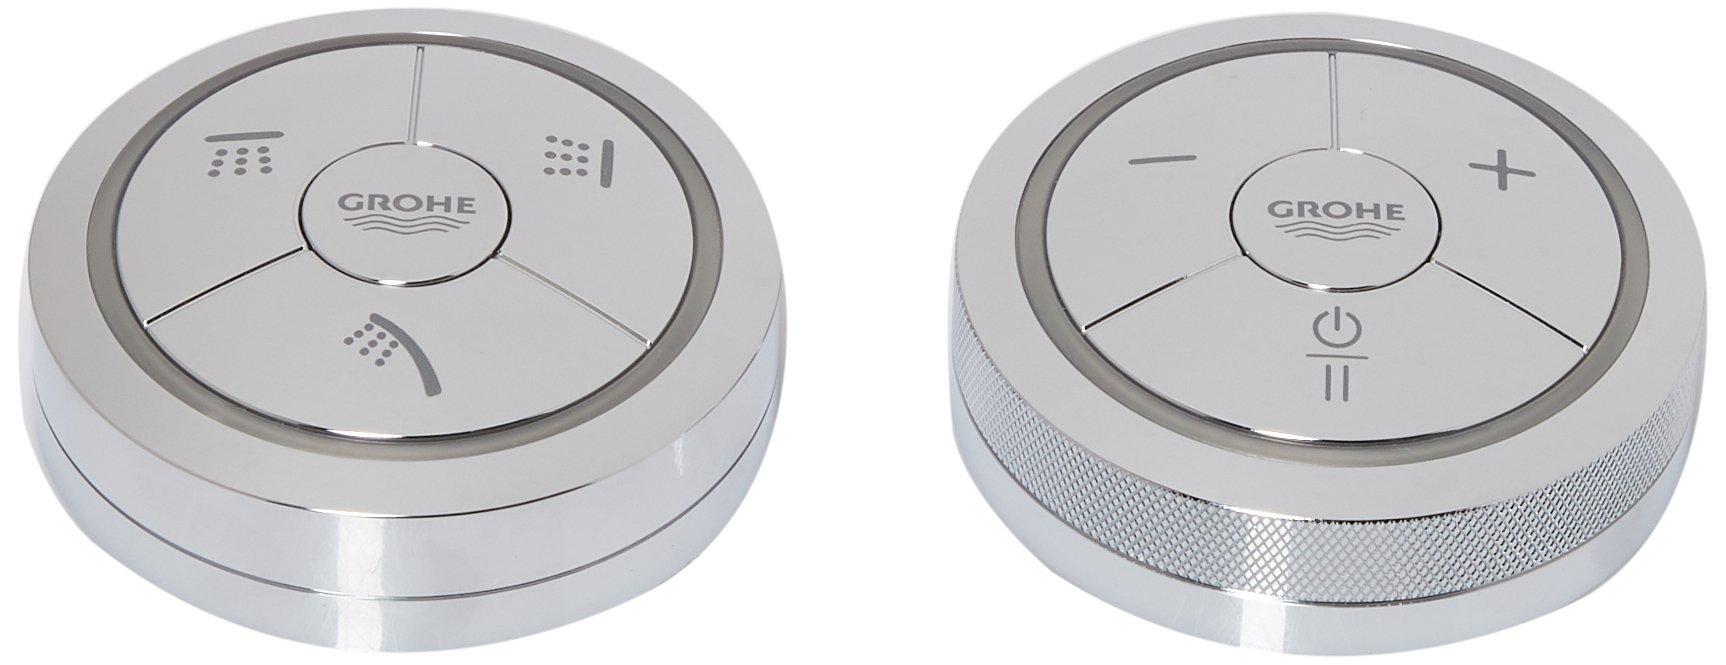 F-Digital Digital Controller And Diverter (Shower Head/Handshower/Body Spray)